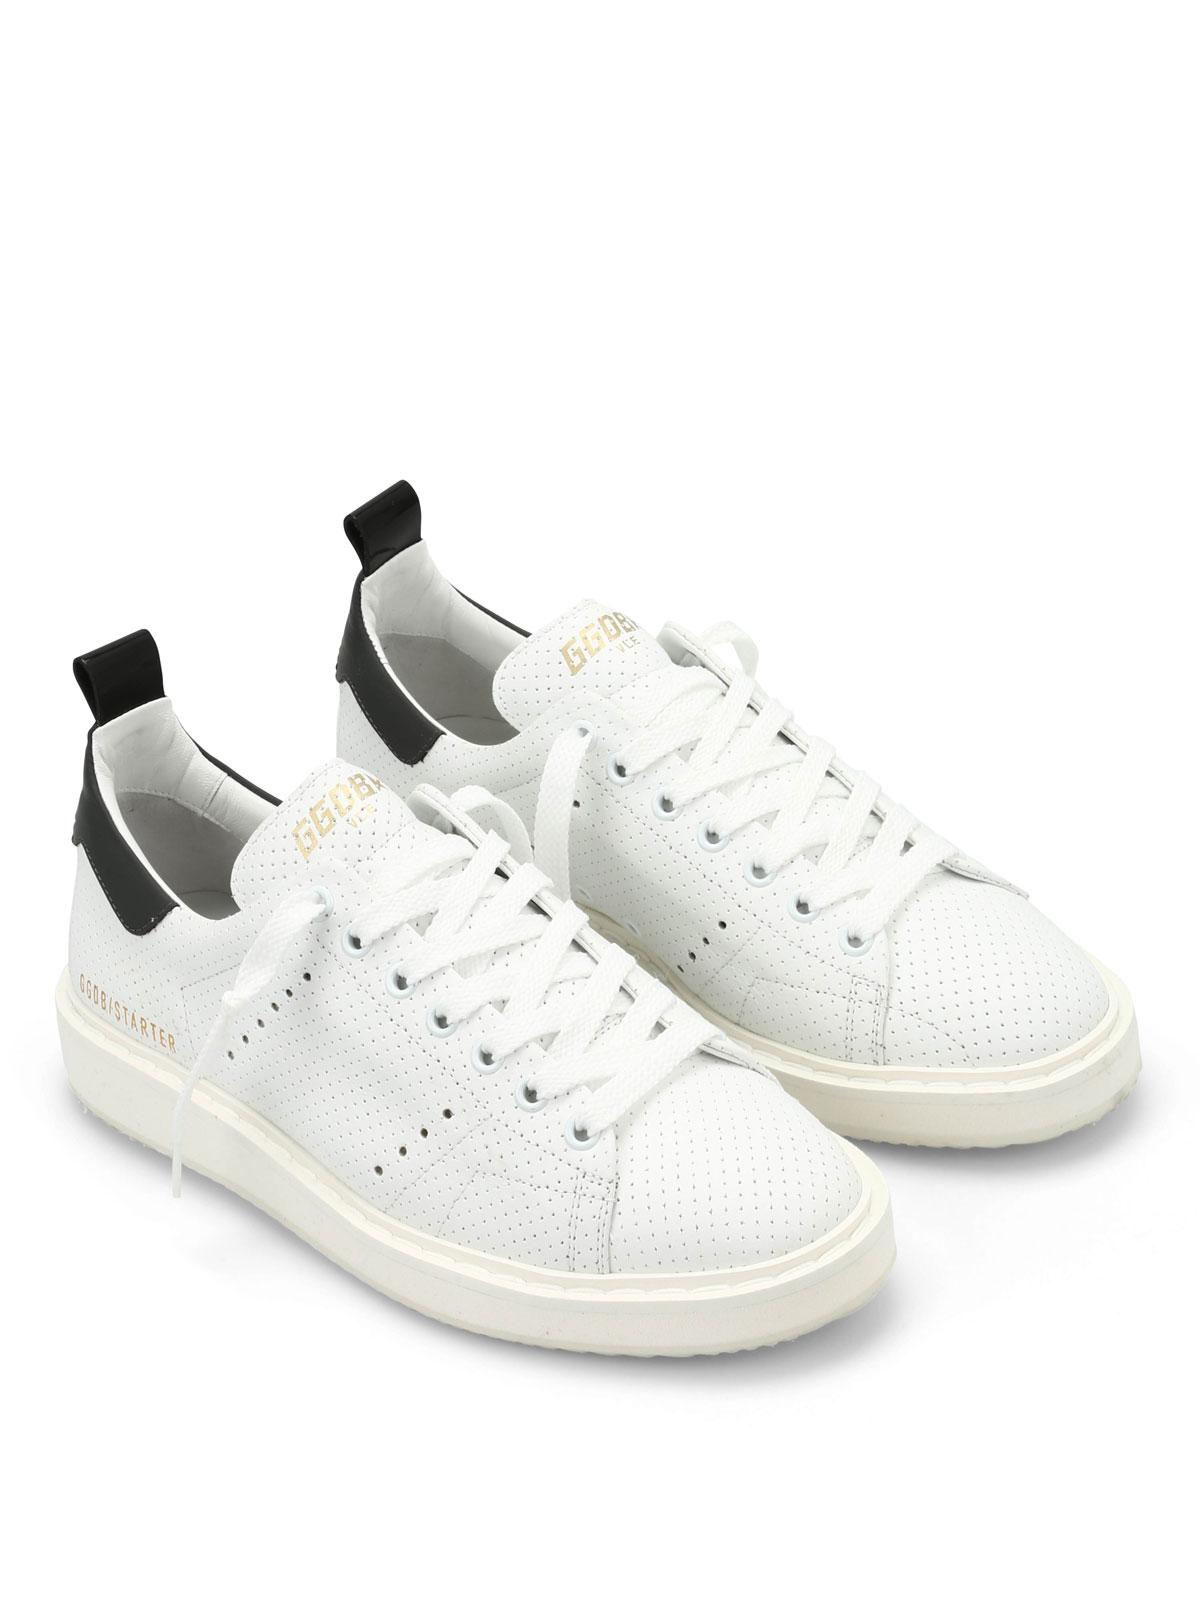 best service 83057 497fb golden goose scarpe uomo